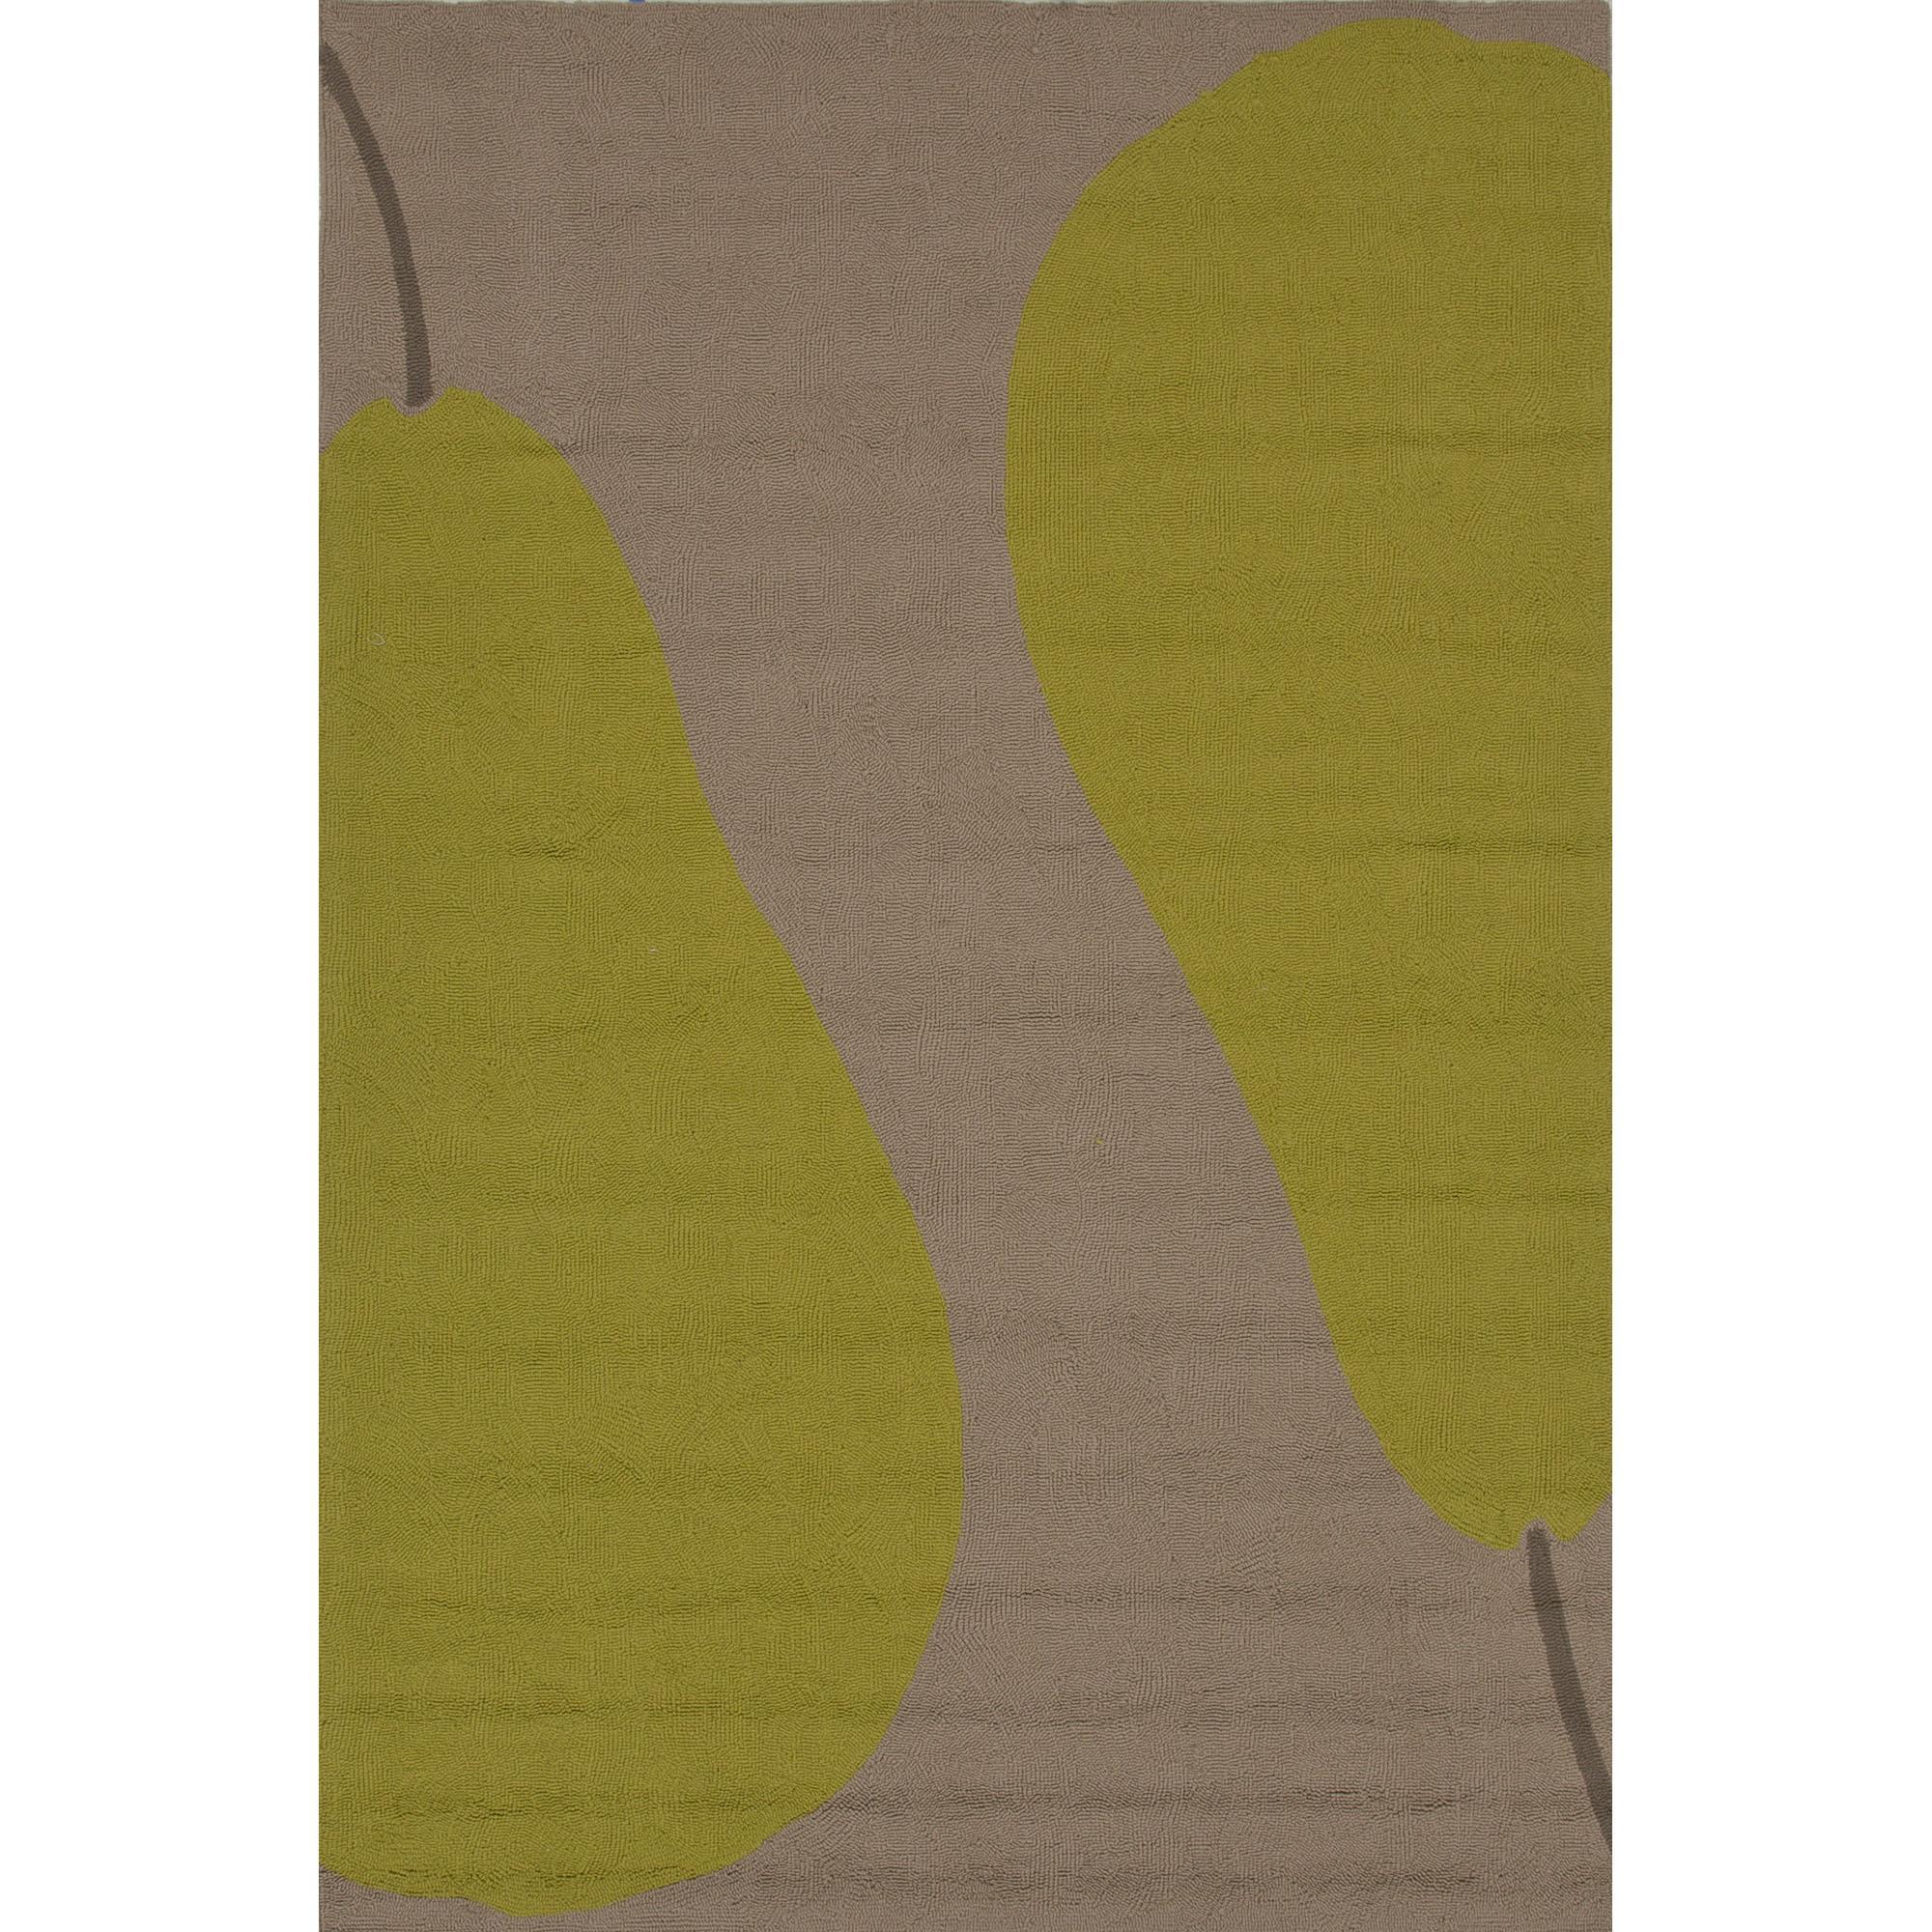 JAIPUR Rugs Grant I-o 3.6 x 5.6 Rug - Item Number: RUG101895